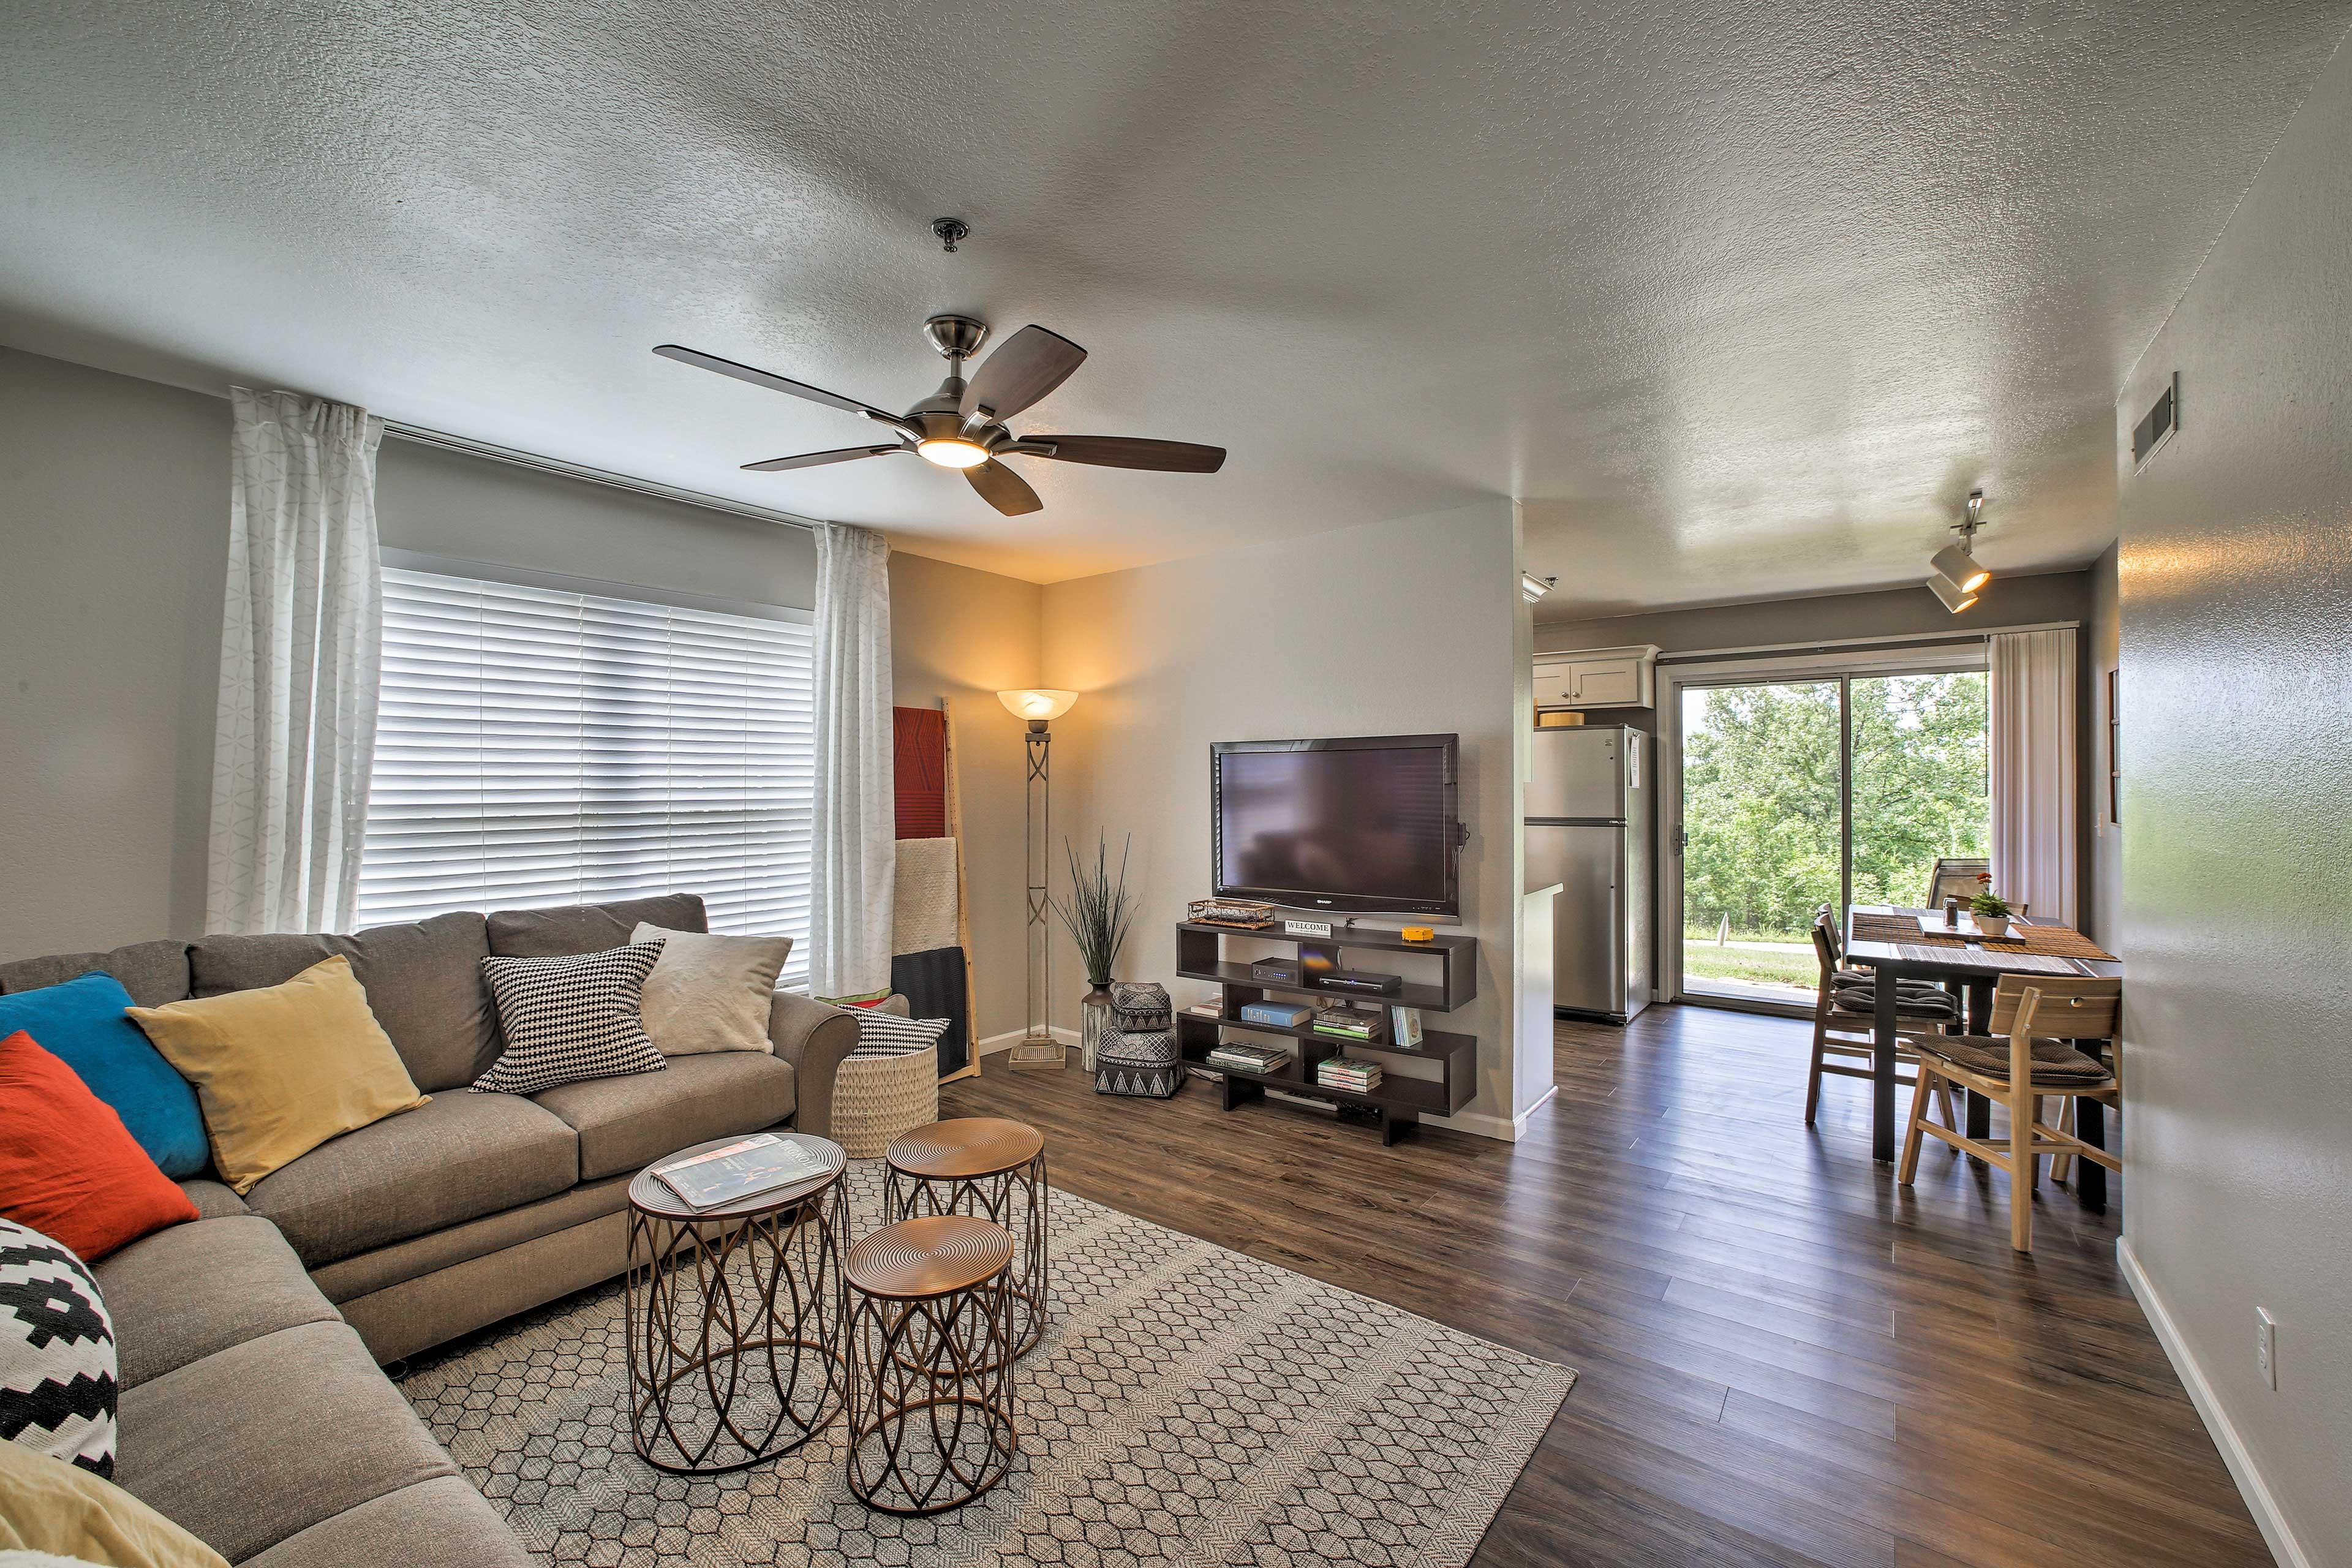 Enjoy Branson in style at this 2-bedroom, 2-bathroom vacation rental condo!